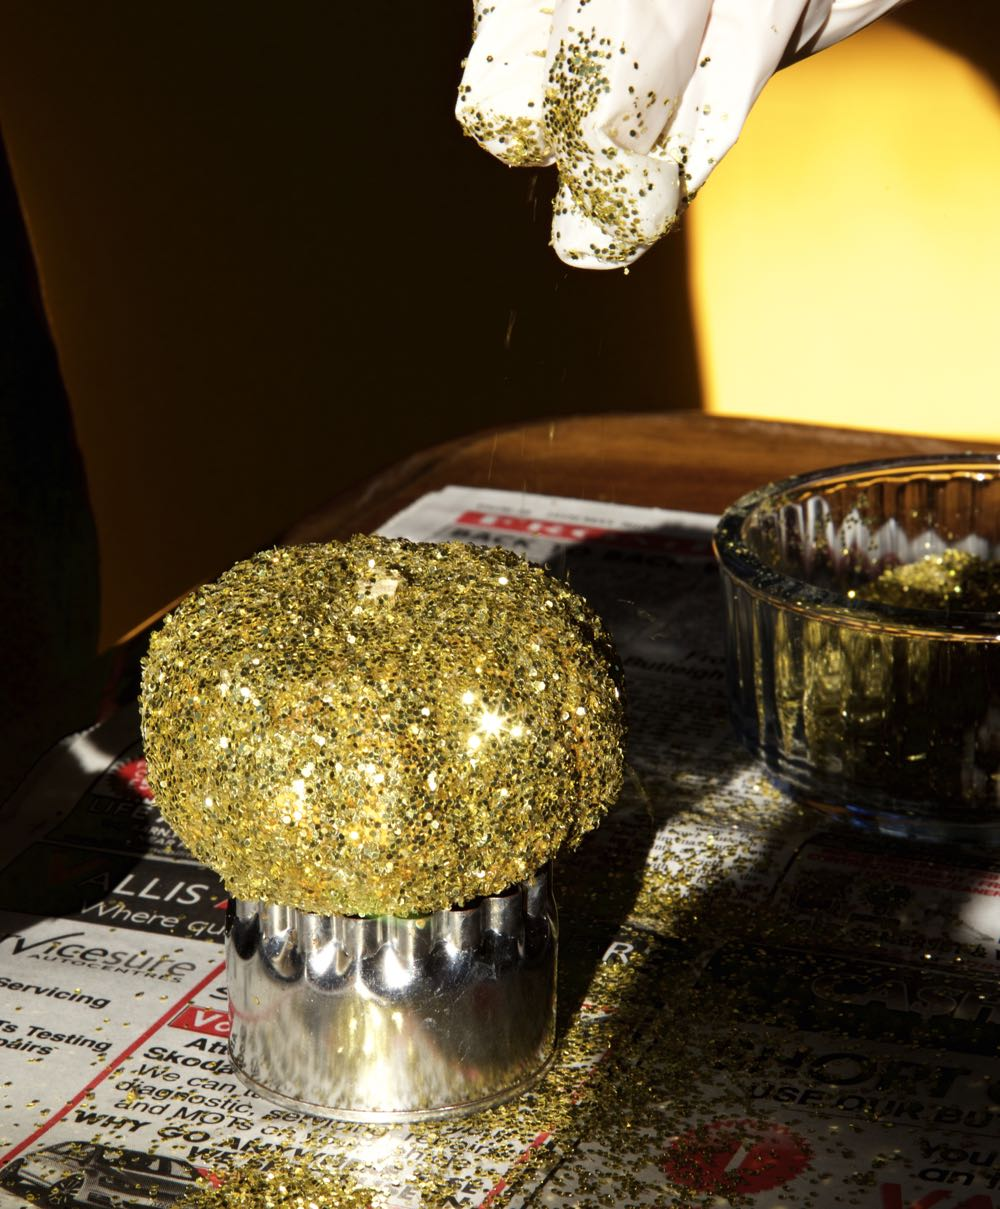 A sprinkle of glitter onto the pumpkin.